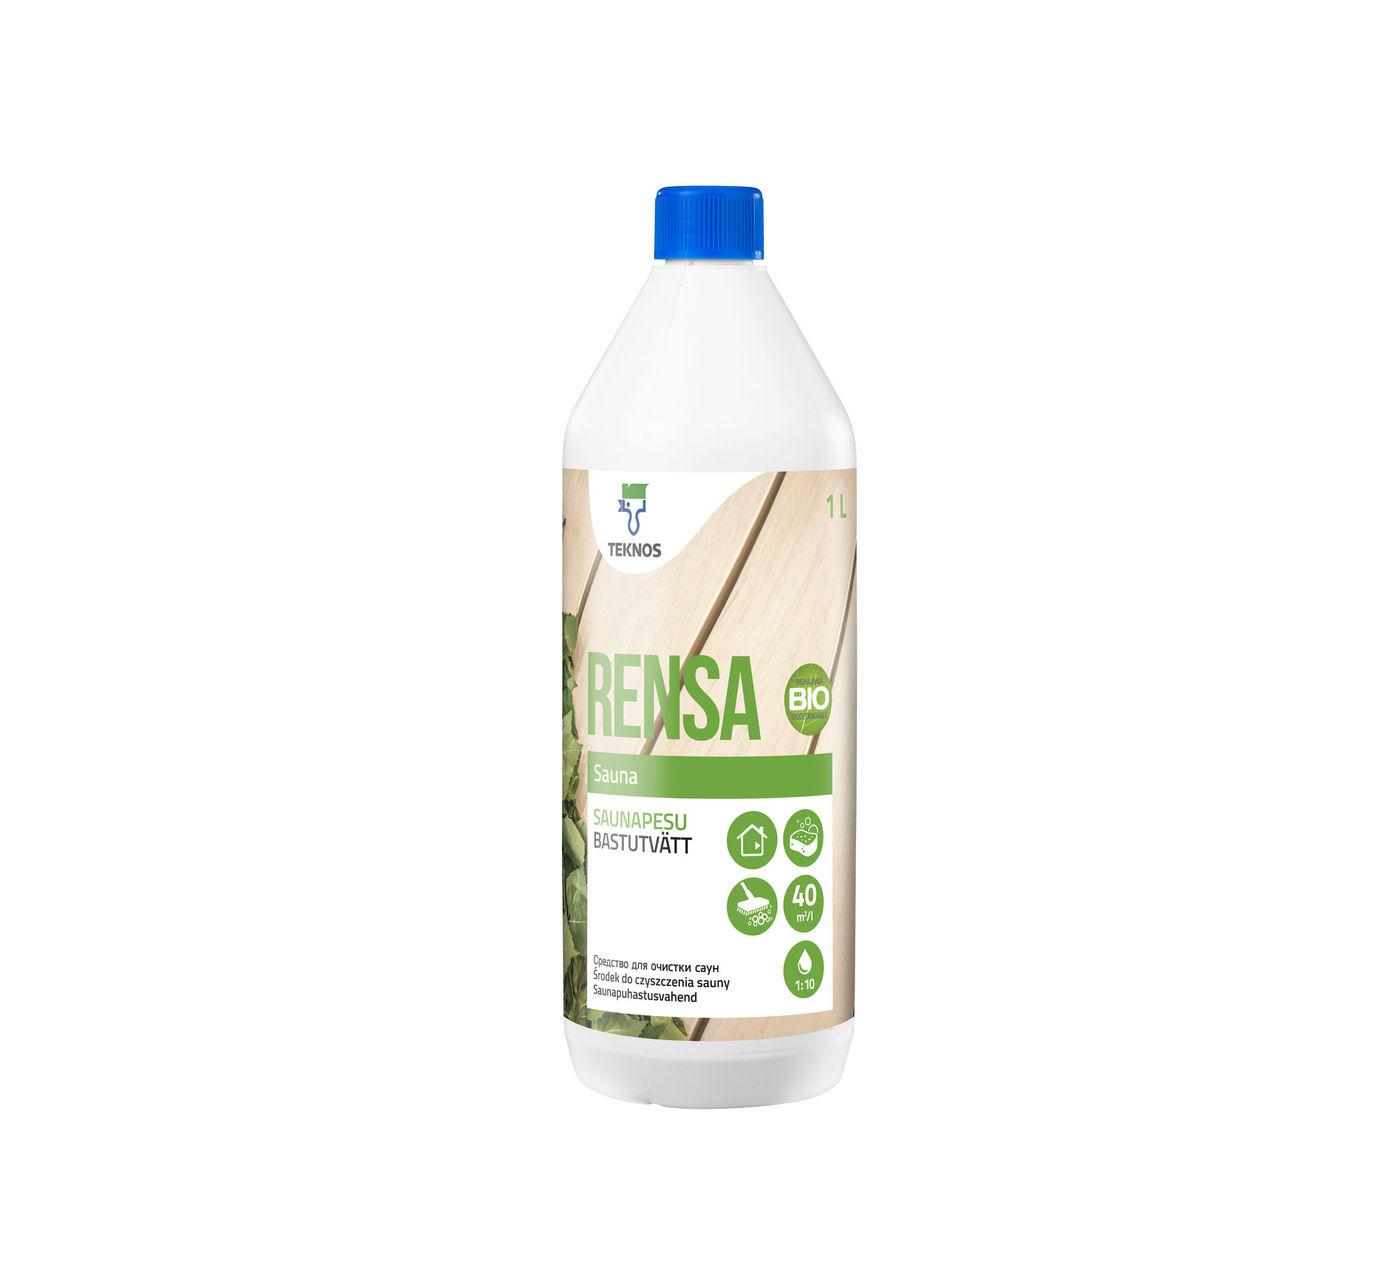 RENSA SAUNA средство для очистки саун